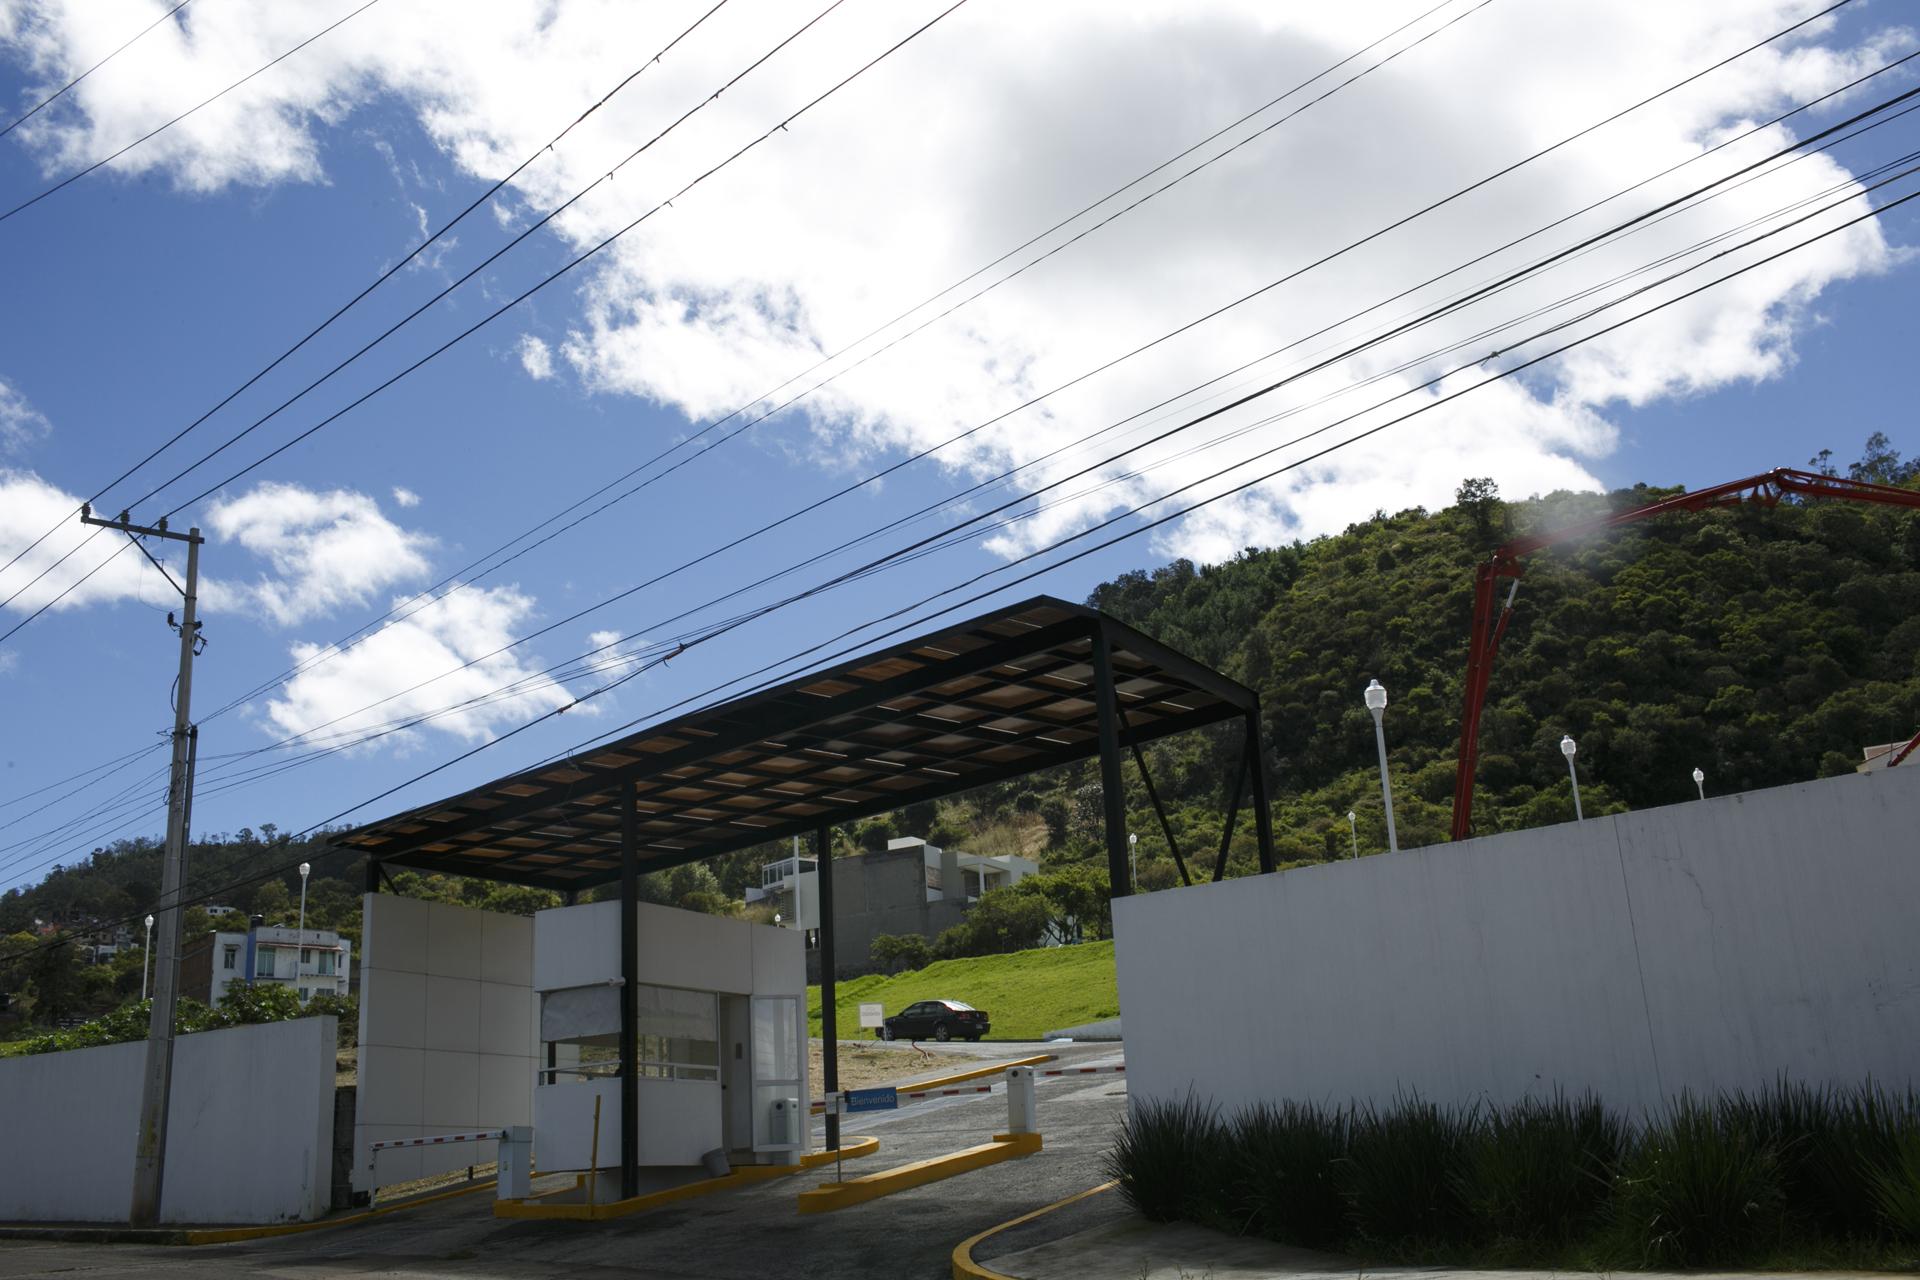 Puntalba 2 ¡Disponible! - Imagen 3